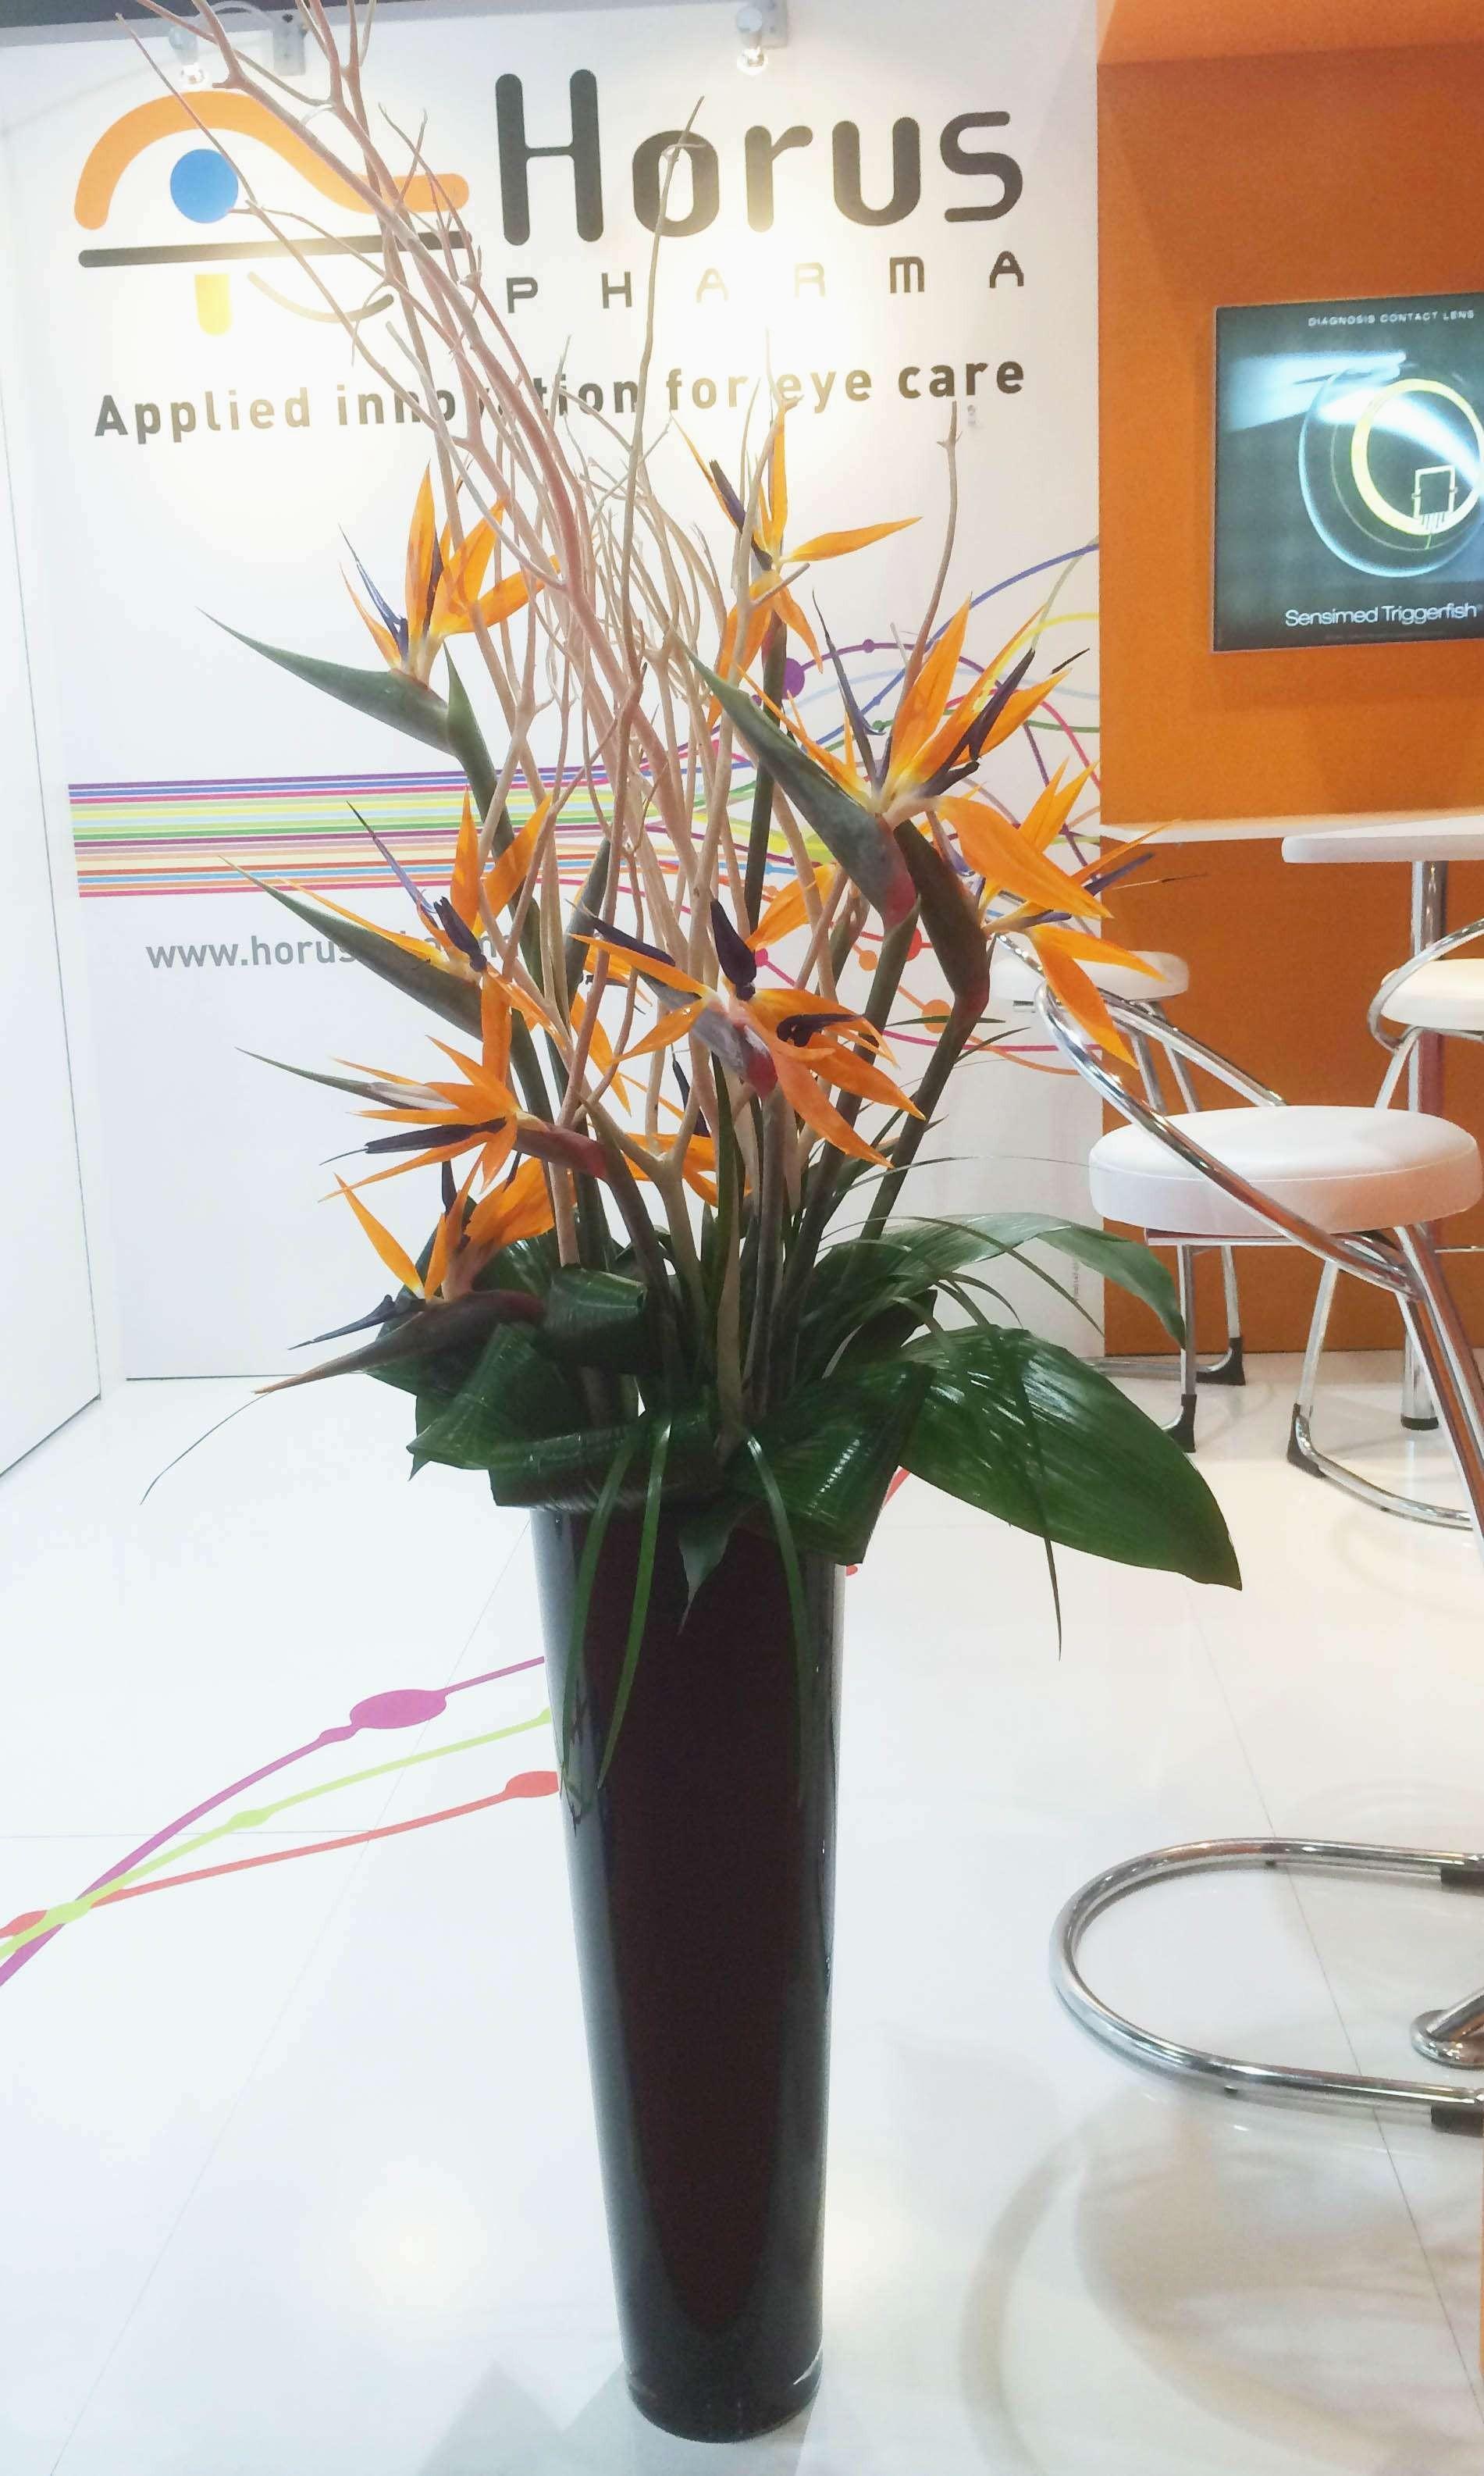 Dining Table Flower Arrangements Beautiful 2 Od orange Bird Paradise Twig Foliage In Black Vase Concept